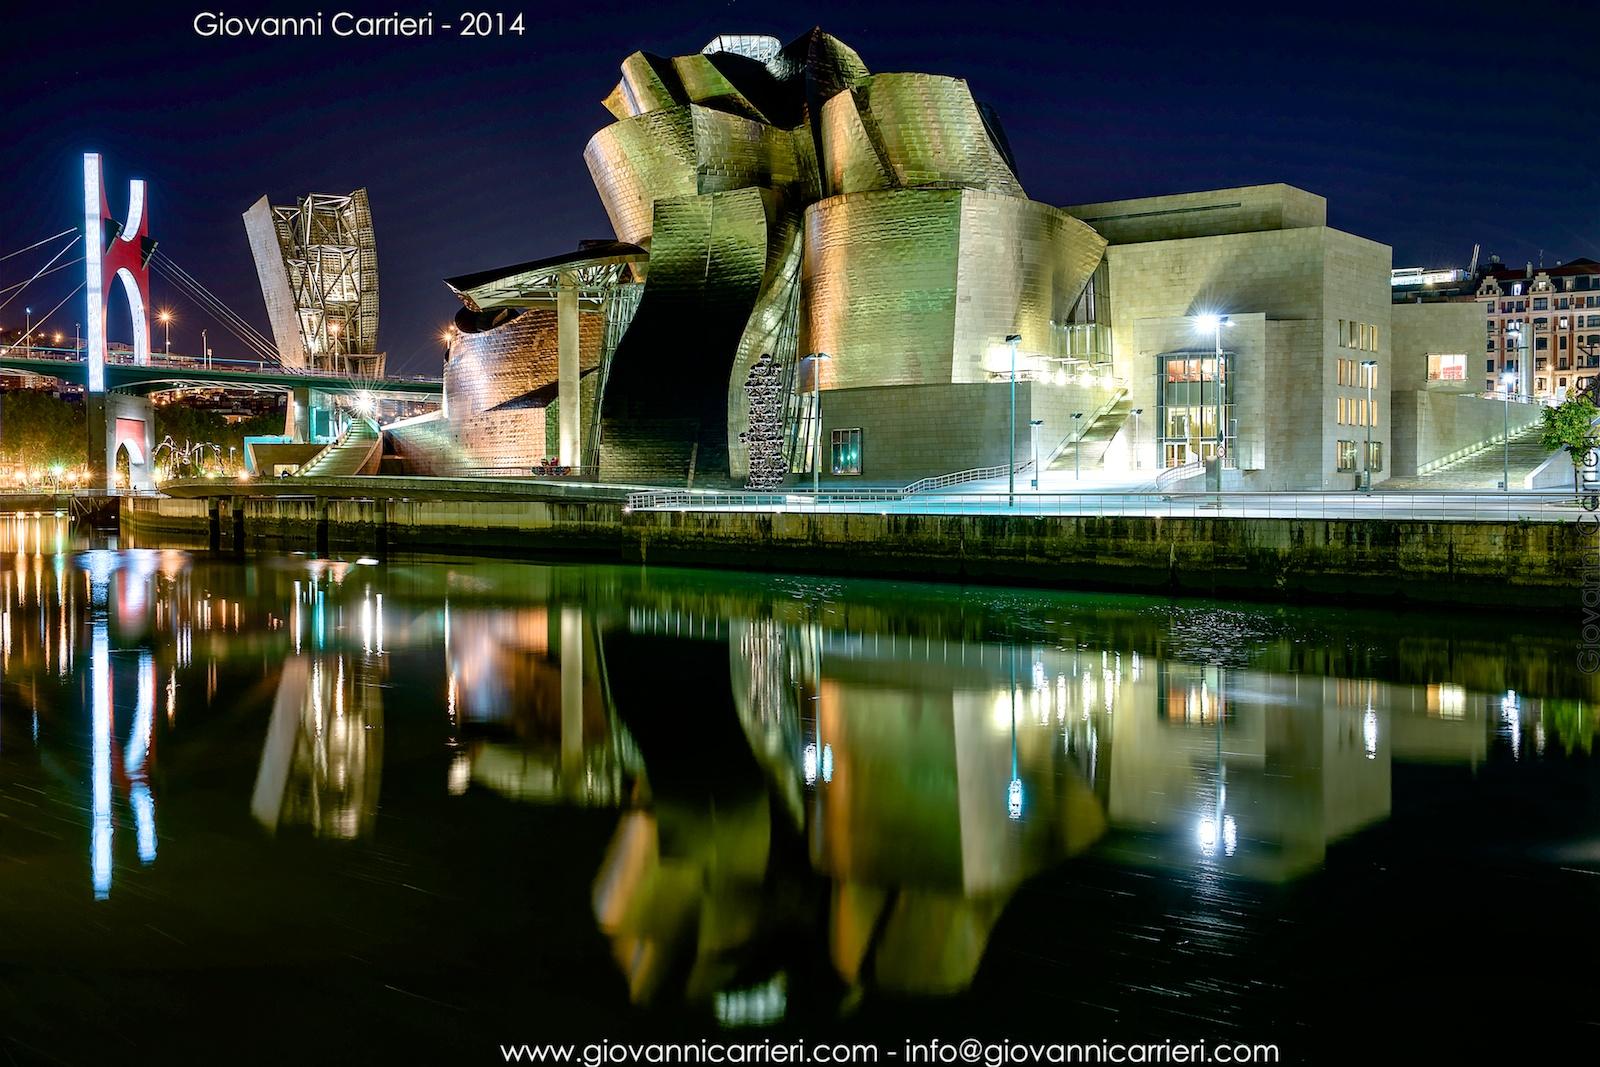 Vista notturna del Guggenheim ed il ponte De la Salve - Bilbao